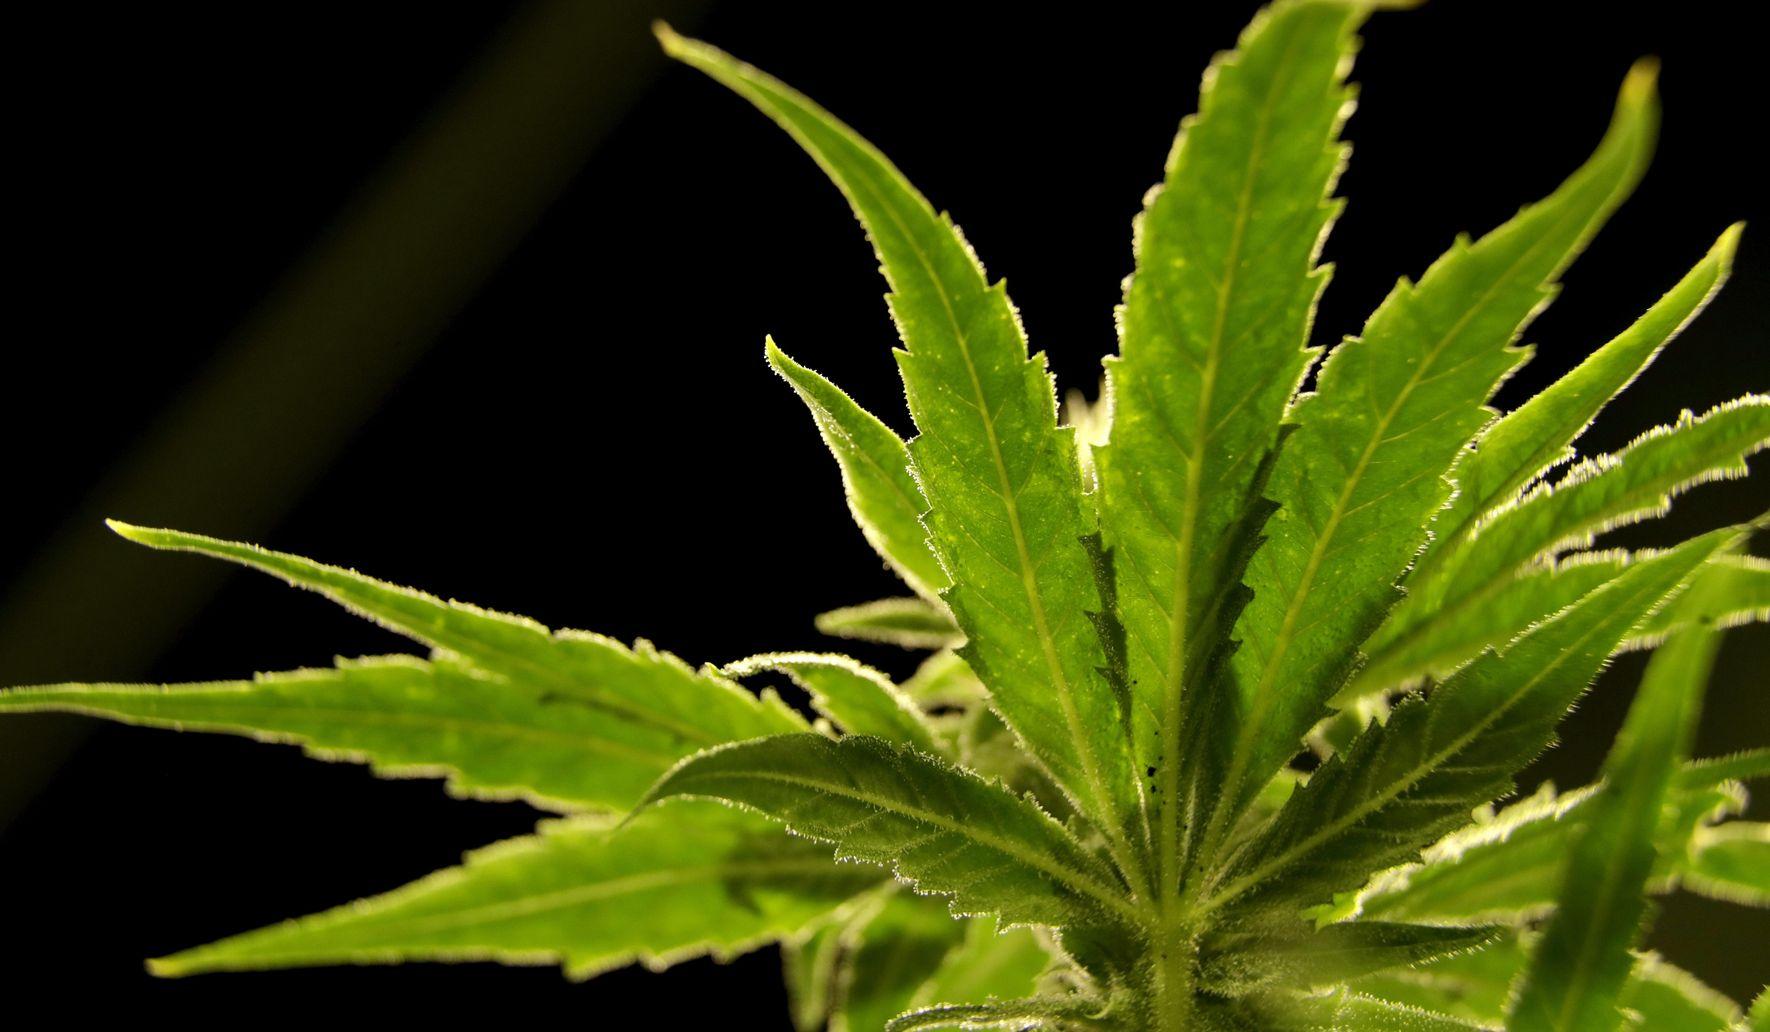 Judiciary Committee passes landmark marijuana legalization bill led by